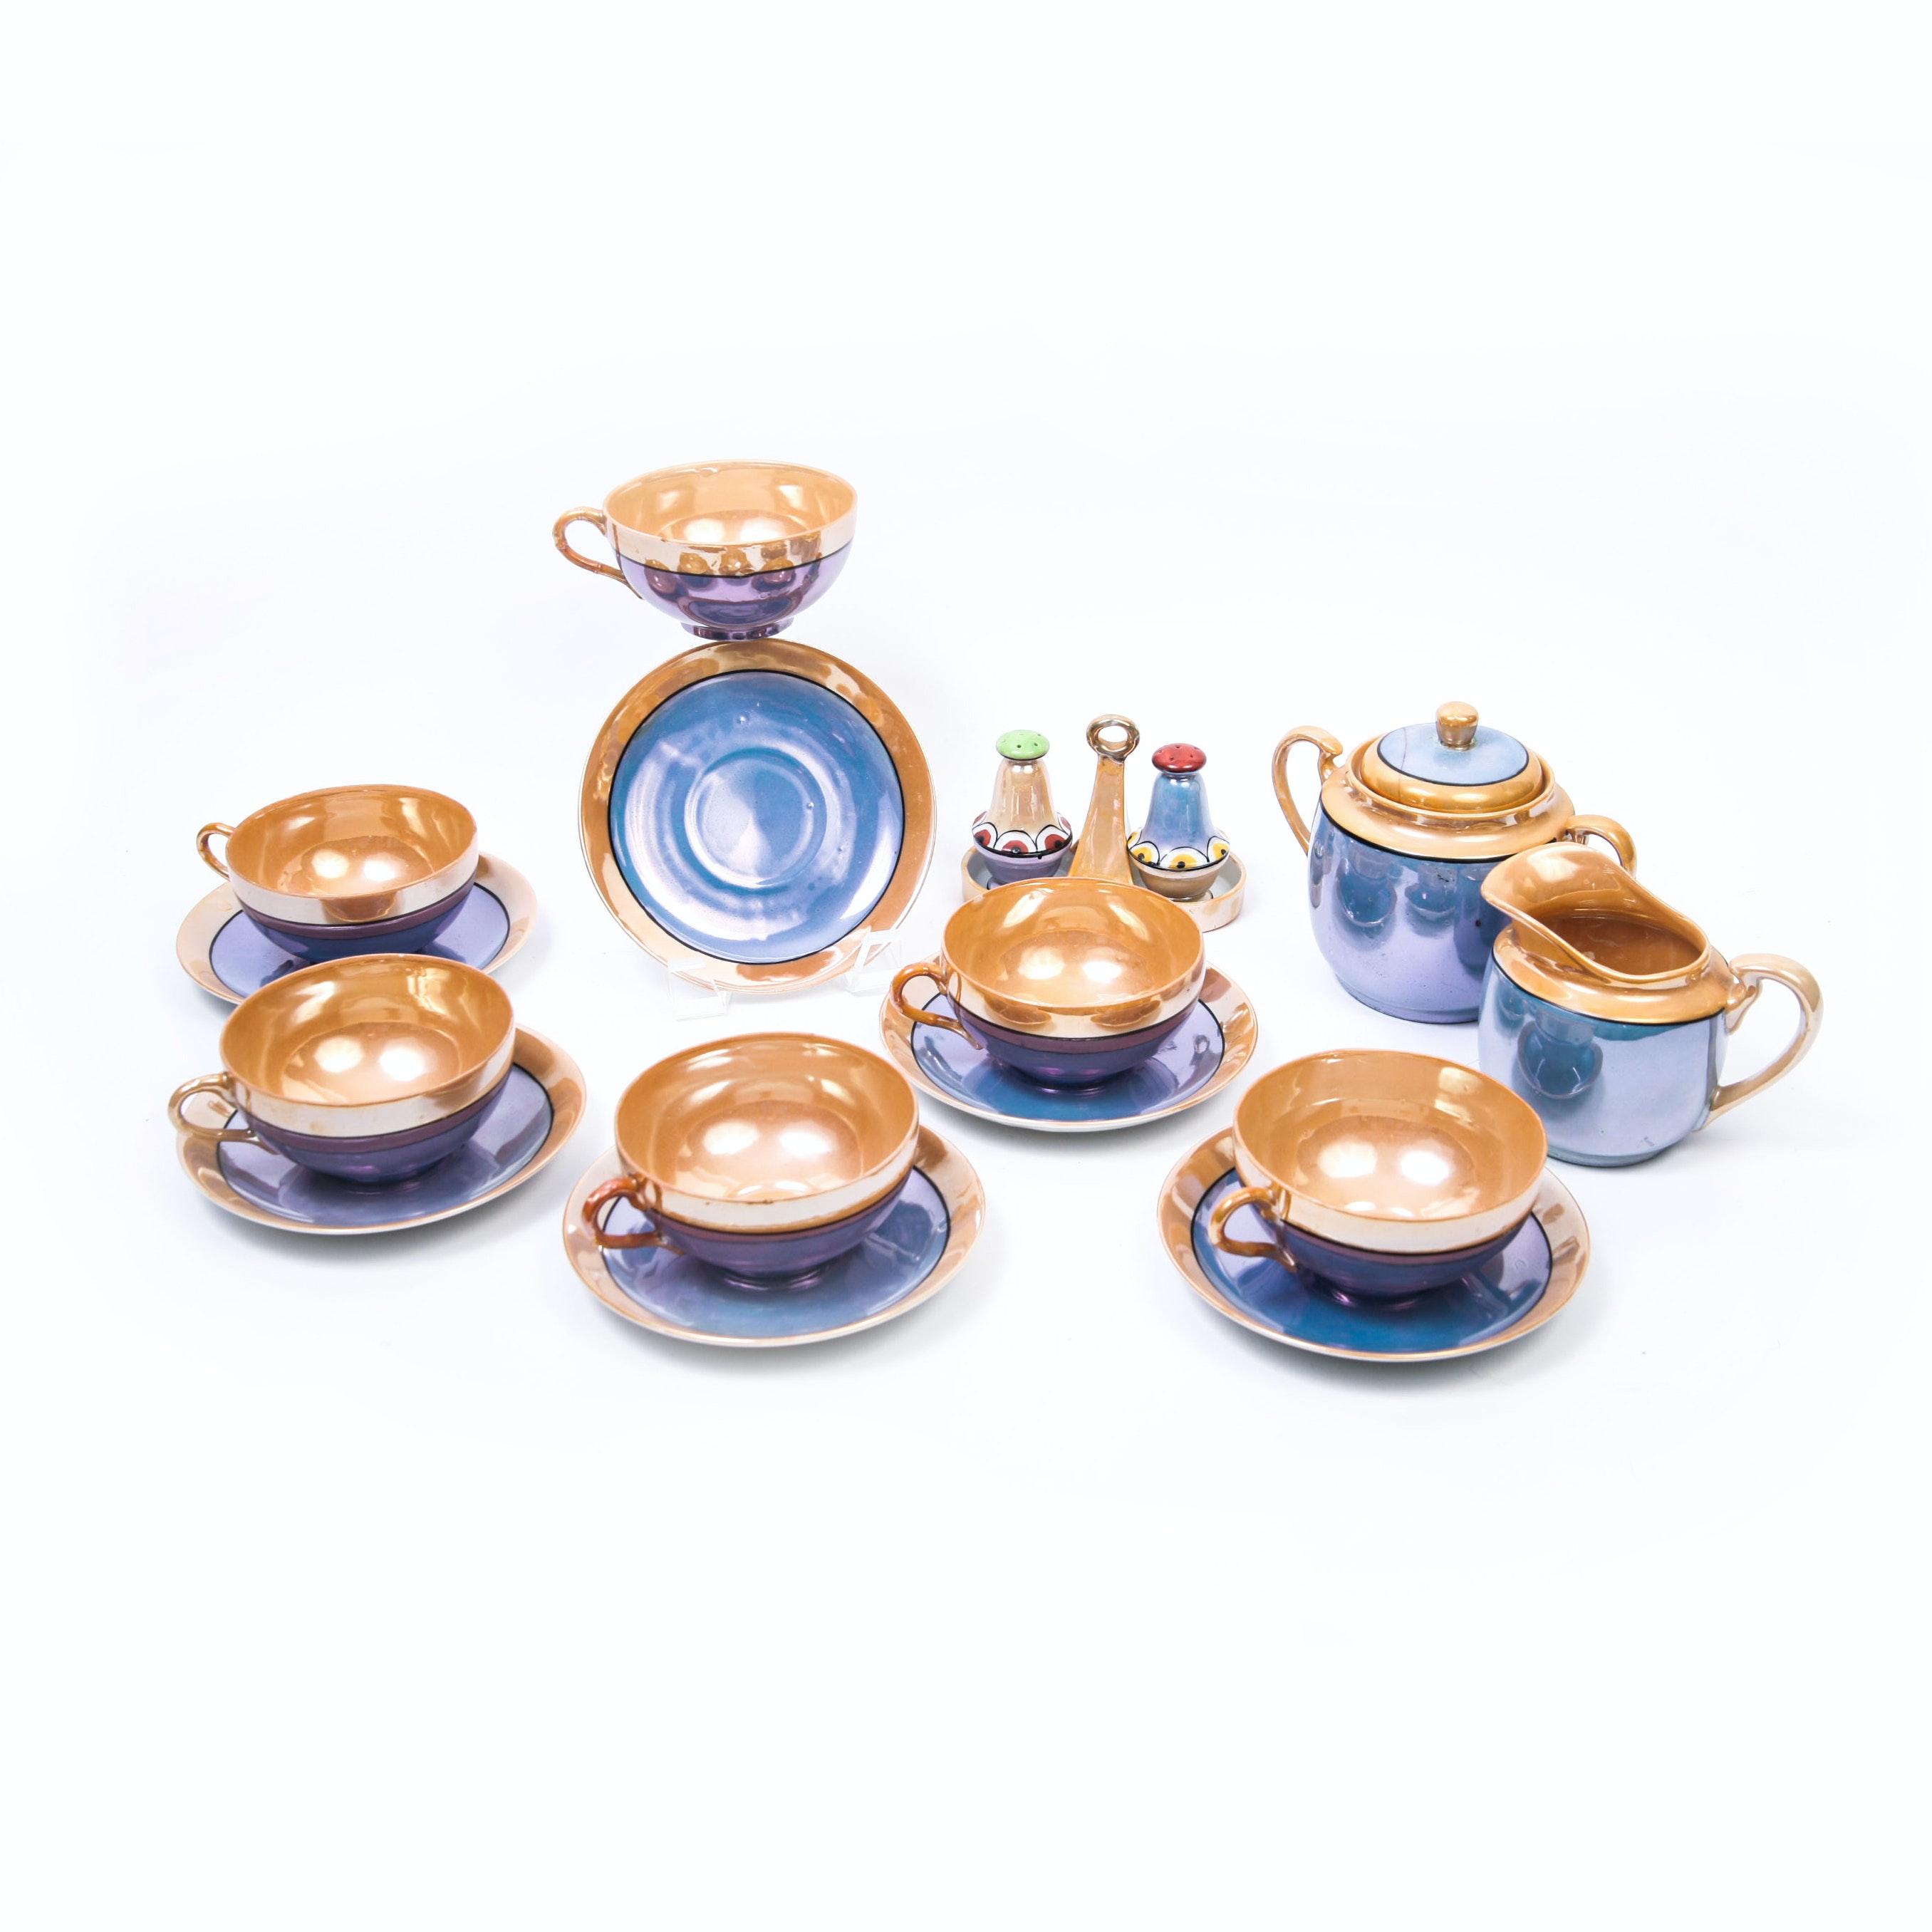 Japanese Lusterware Porcelain Tea Set